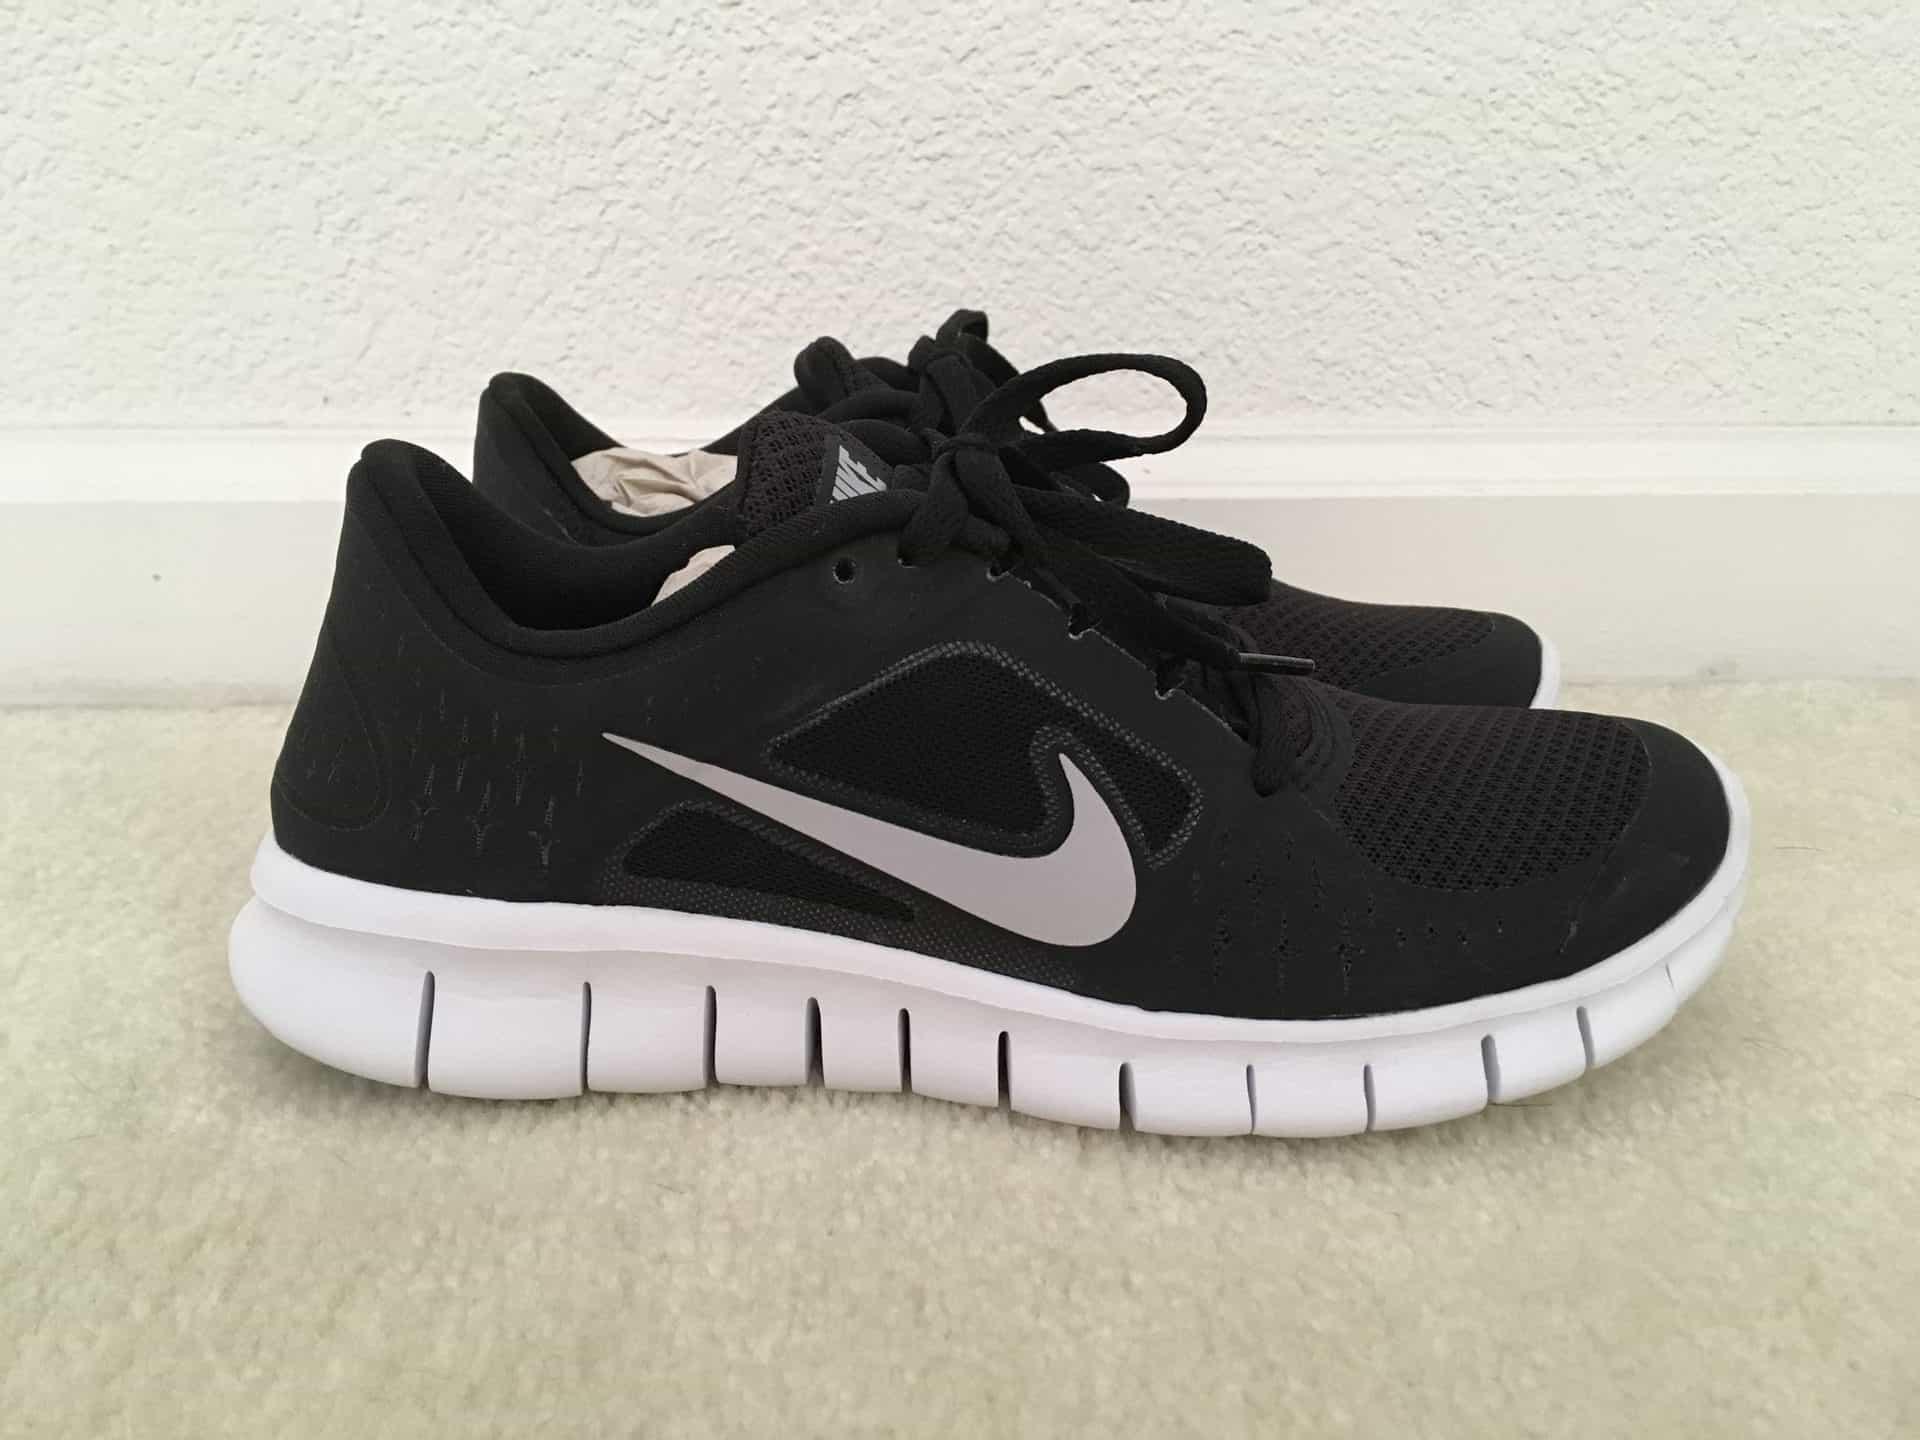 Nike Free Run 3 Travel Shoes